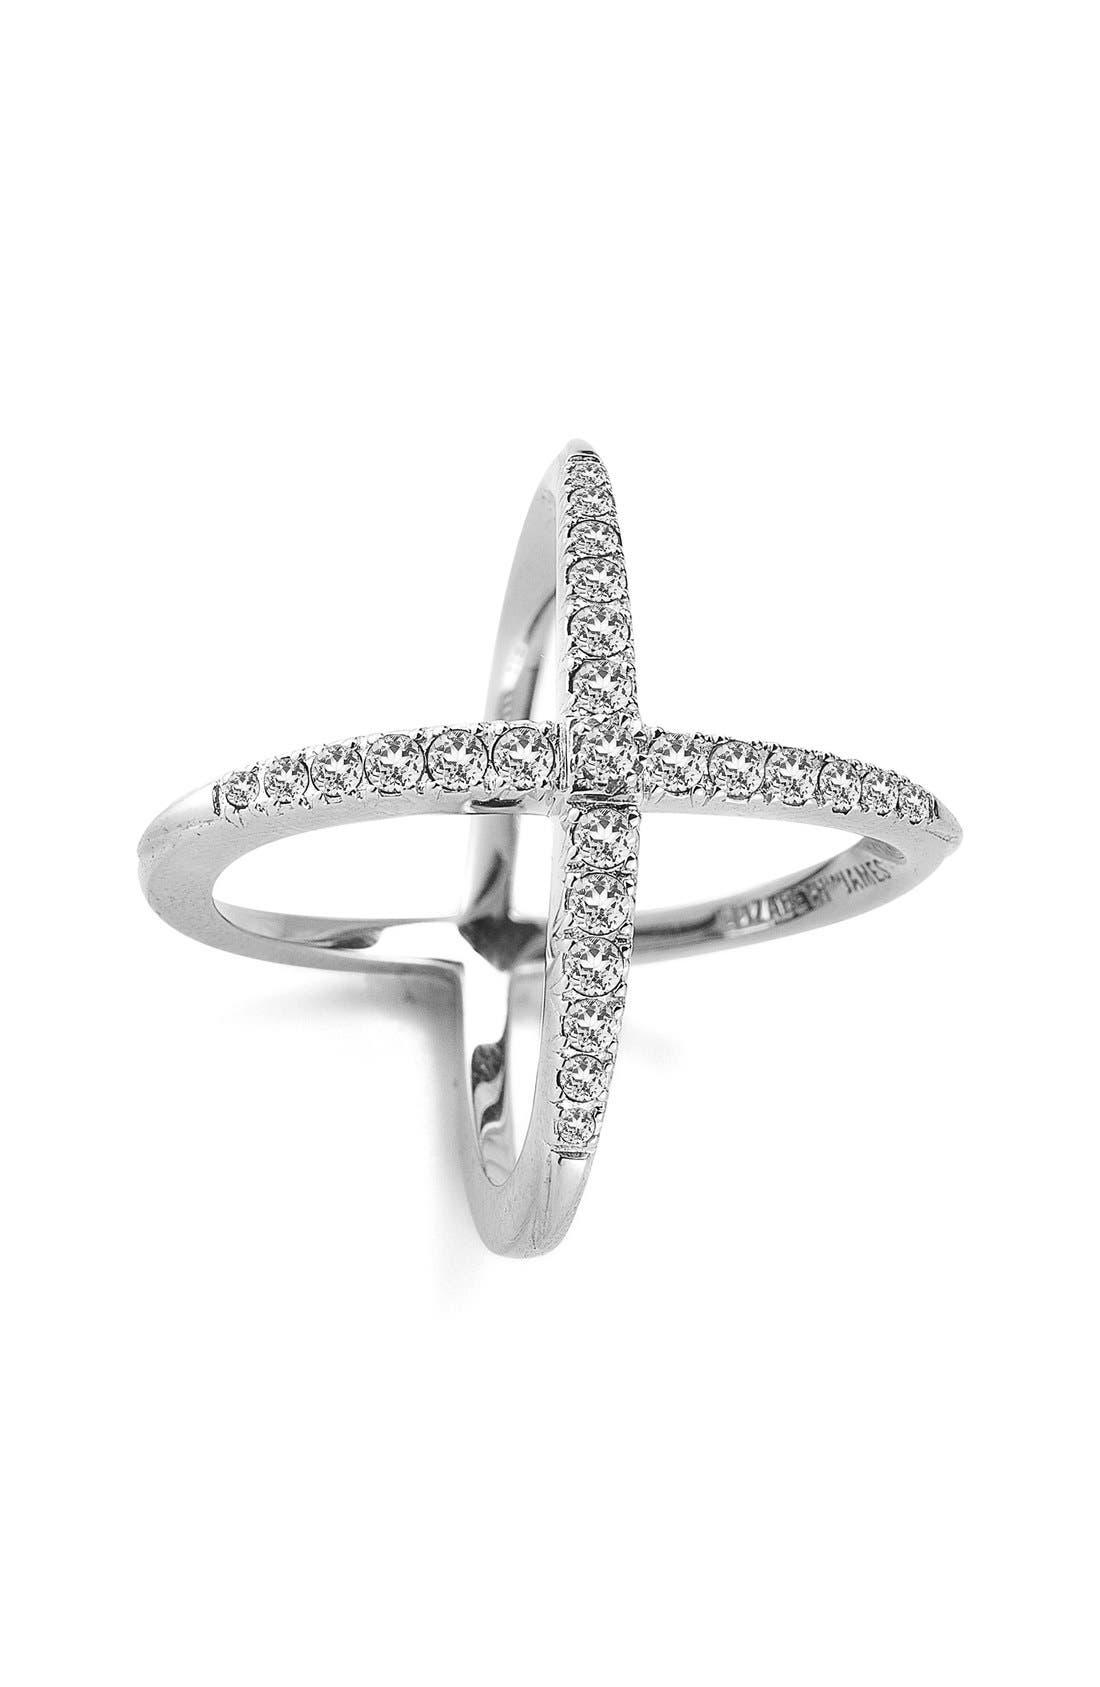 'Windrose' Pavé White Topaz Ring,                             Main thumbnail 1, color,                             040